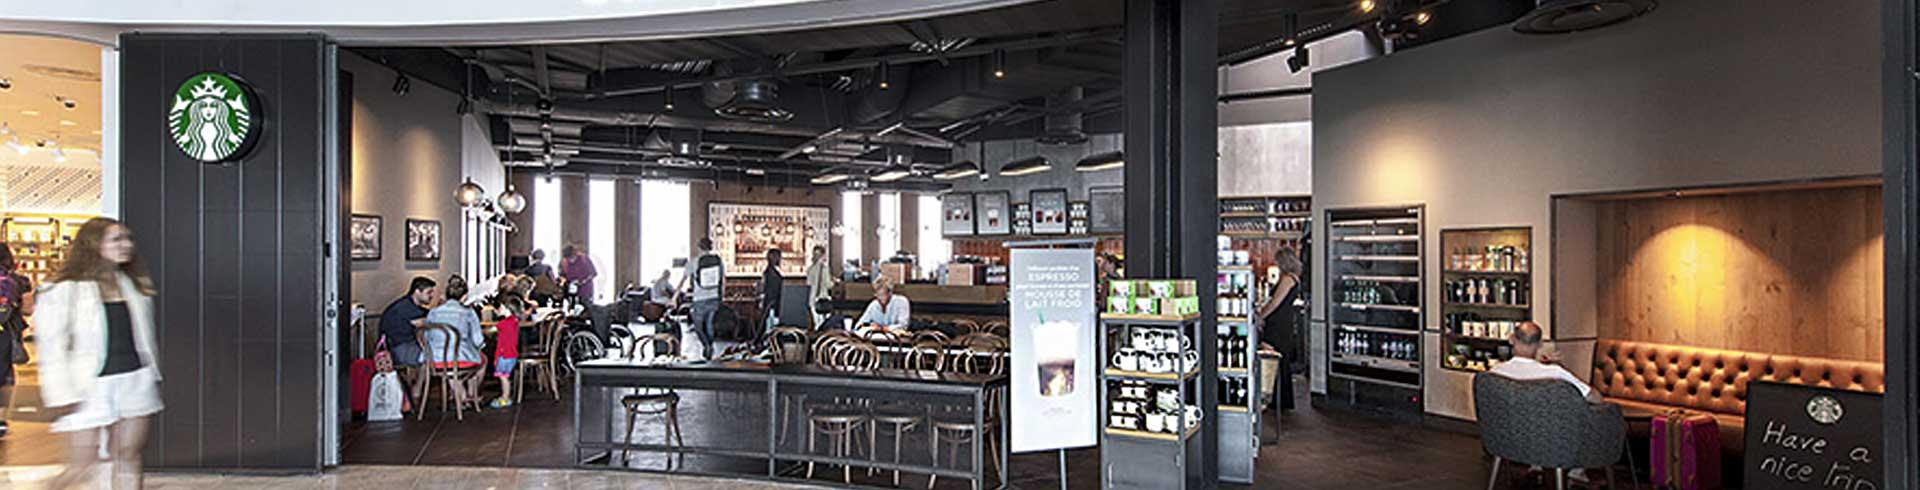 starbucks restaurants bars terminal 2 shops services la promenade nice airport. Black Bedroom Furniture Sets. Home Design Ideas